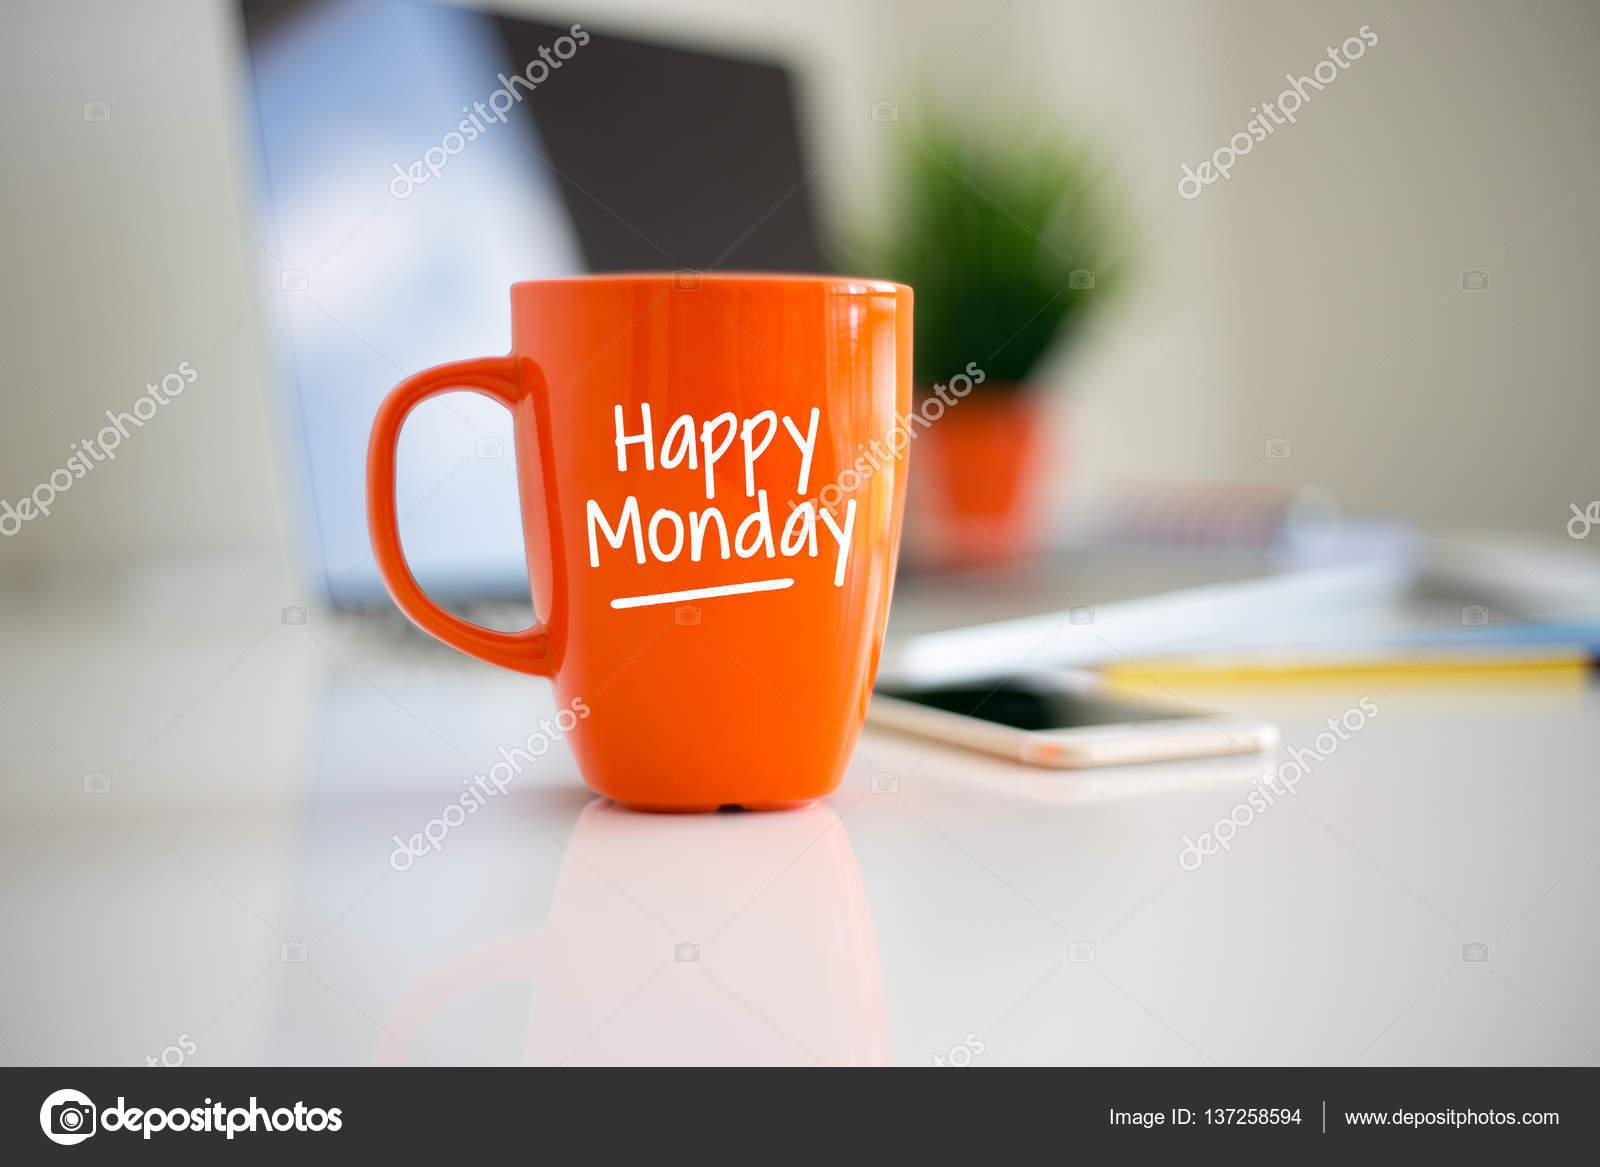 Happy Monday Coffee Cup Stock Photo C Garagestock 137258594